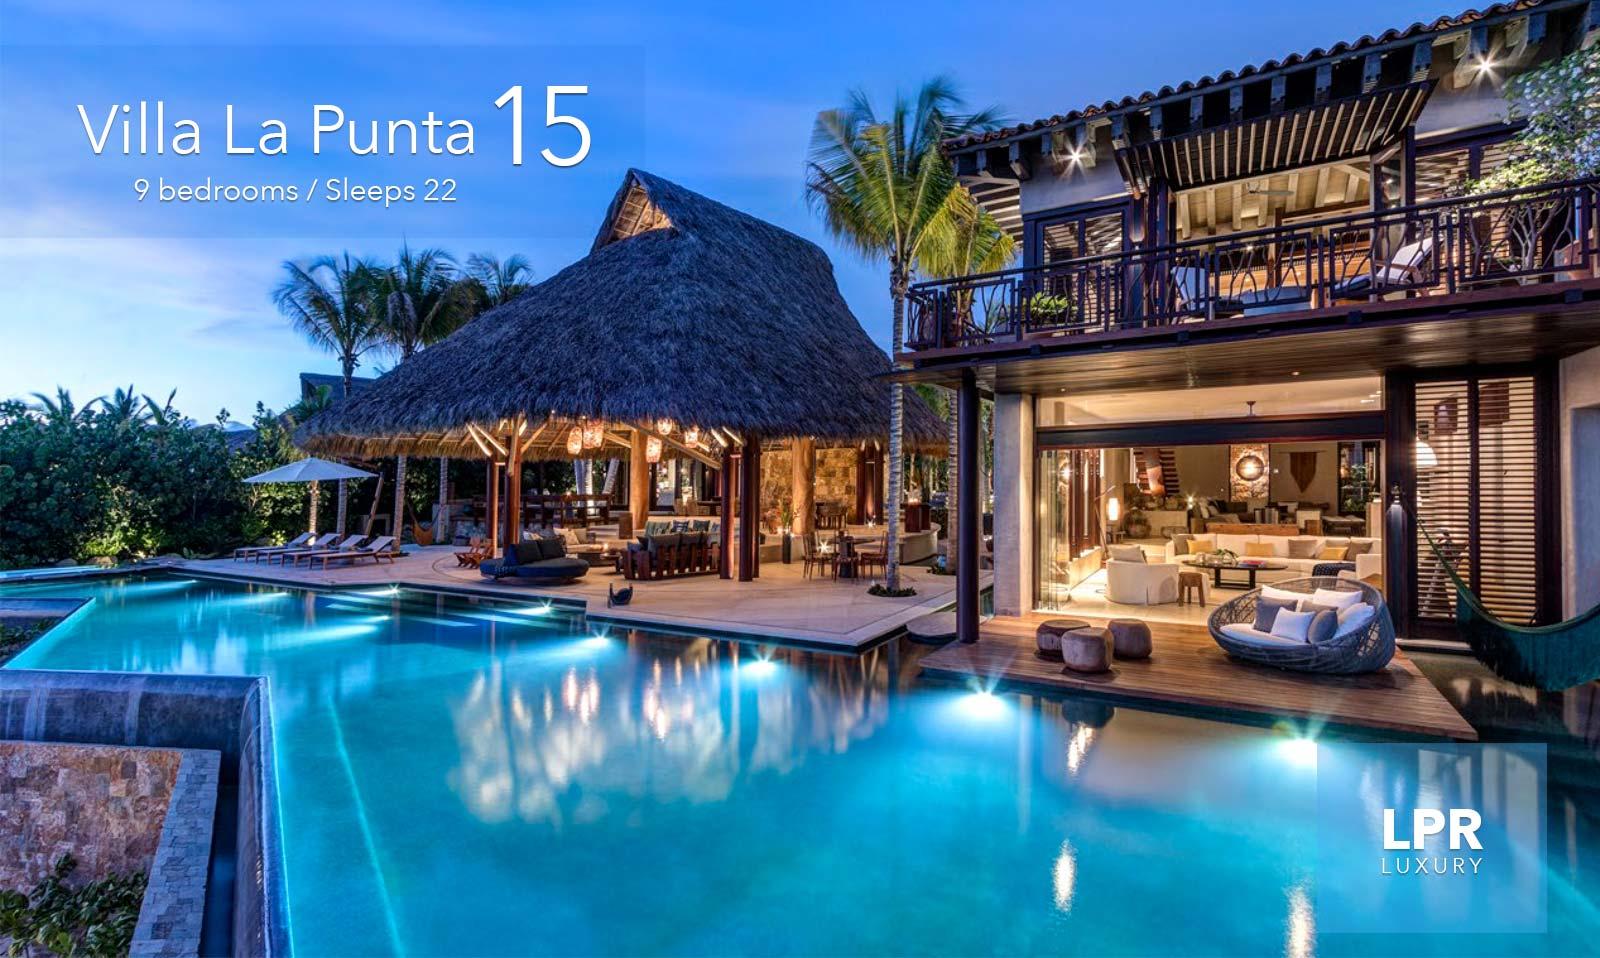 villa la punta 15 ultra luxury beachfront vacation rental villa at the exclusive punta mita